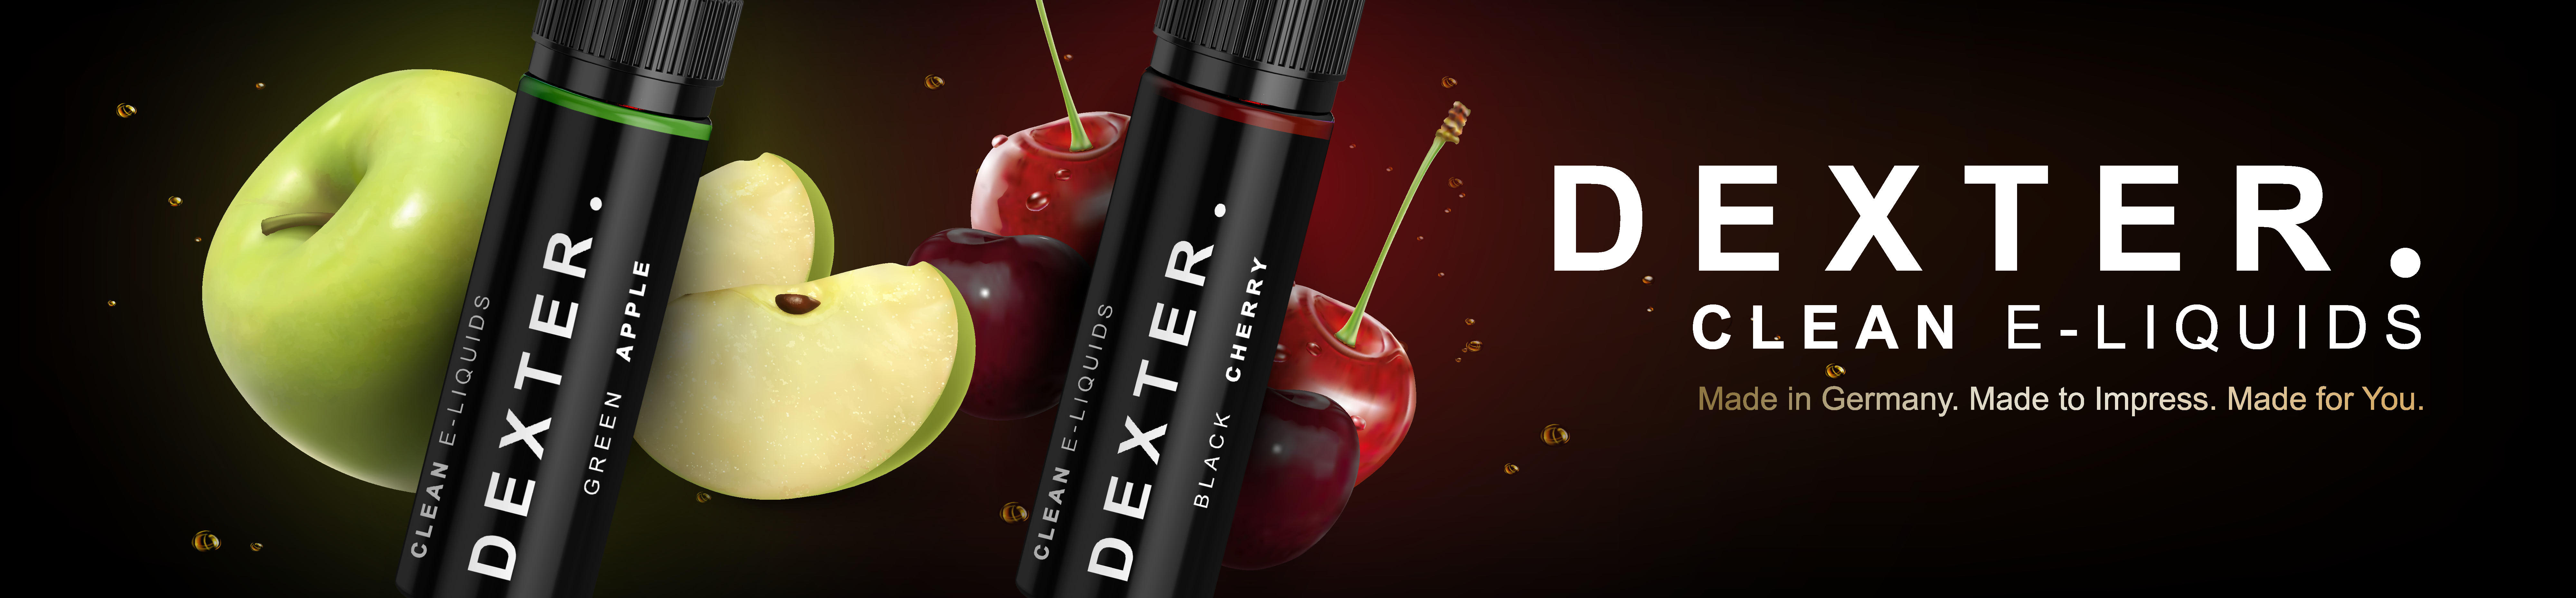 DexterBanner-3-01